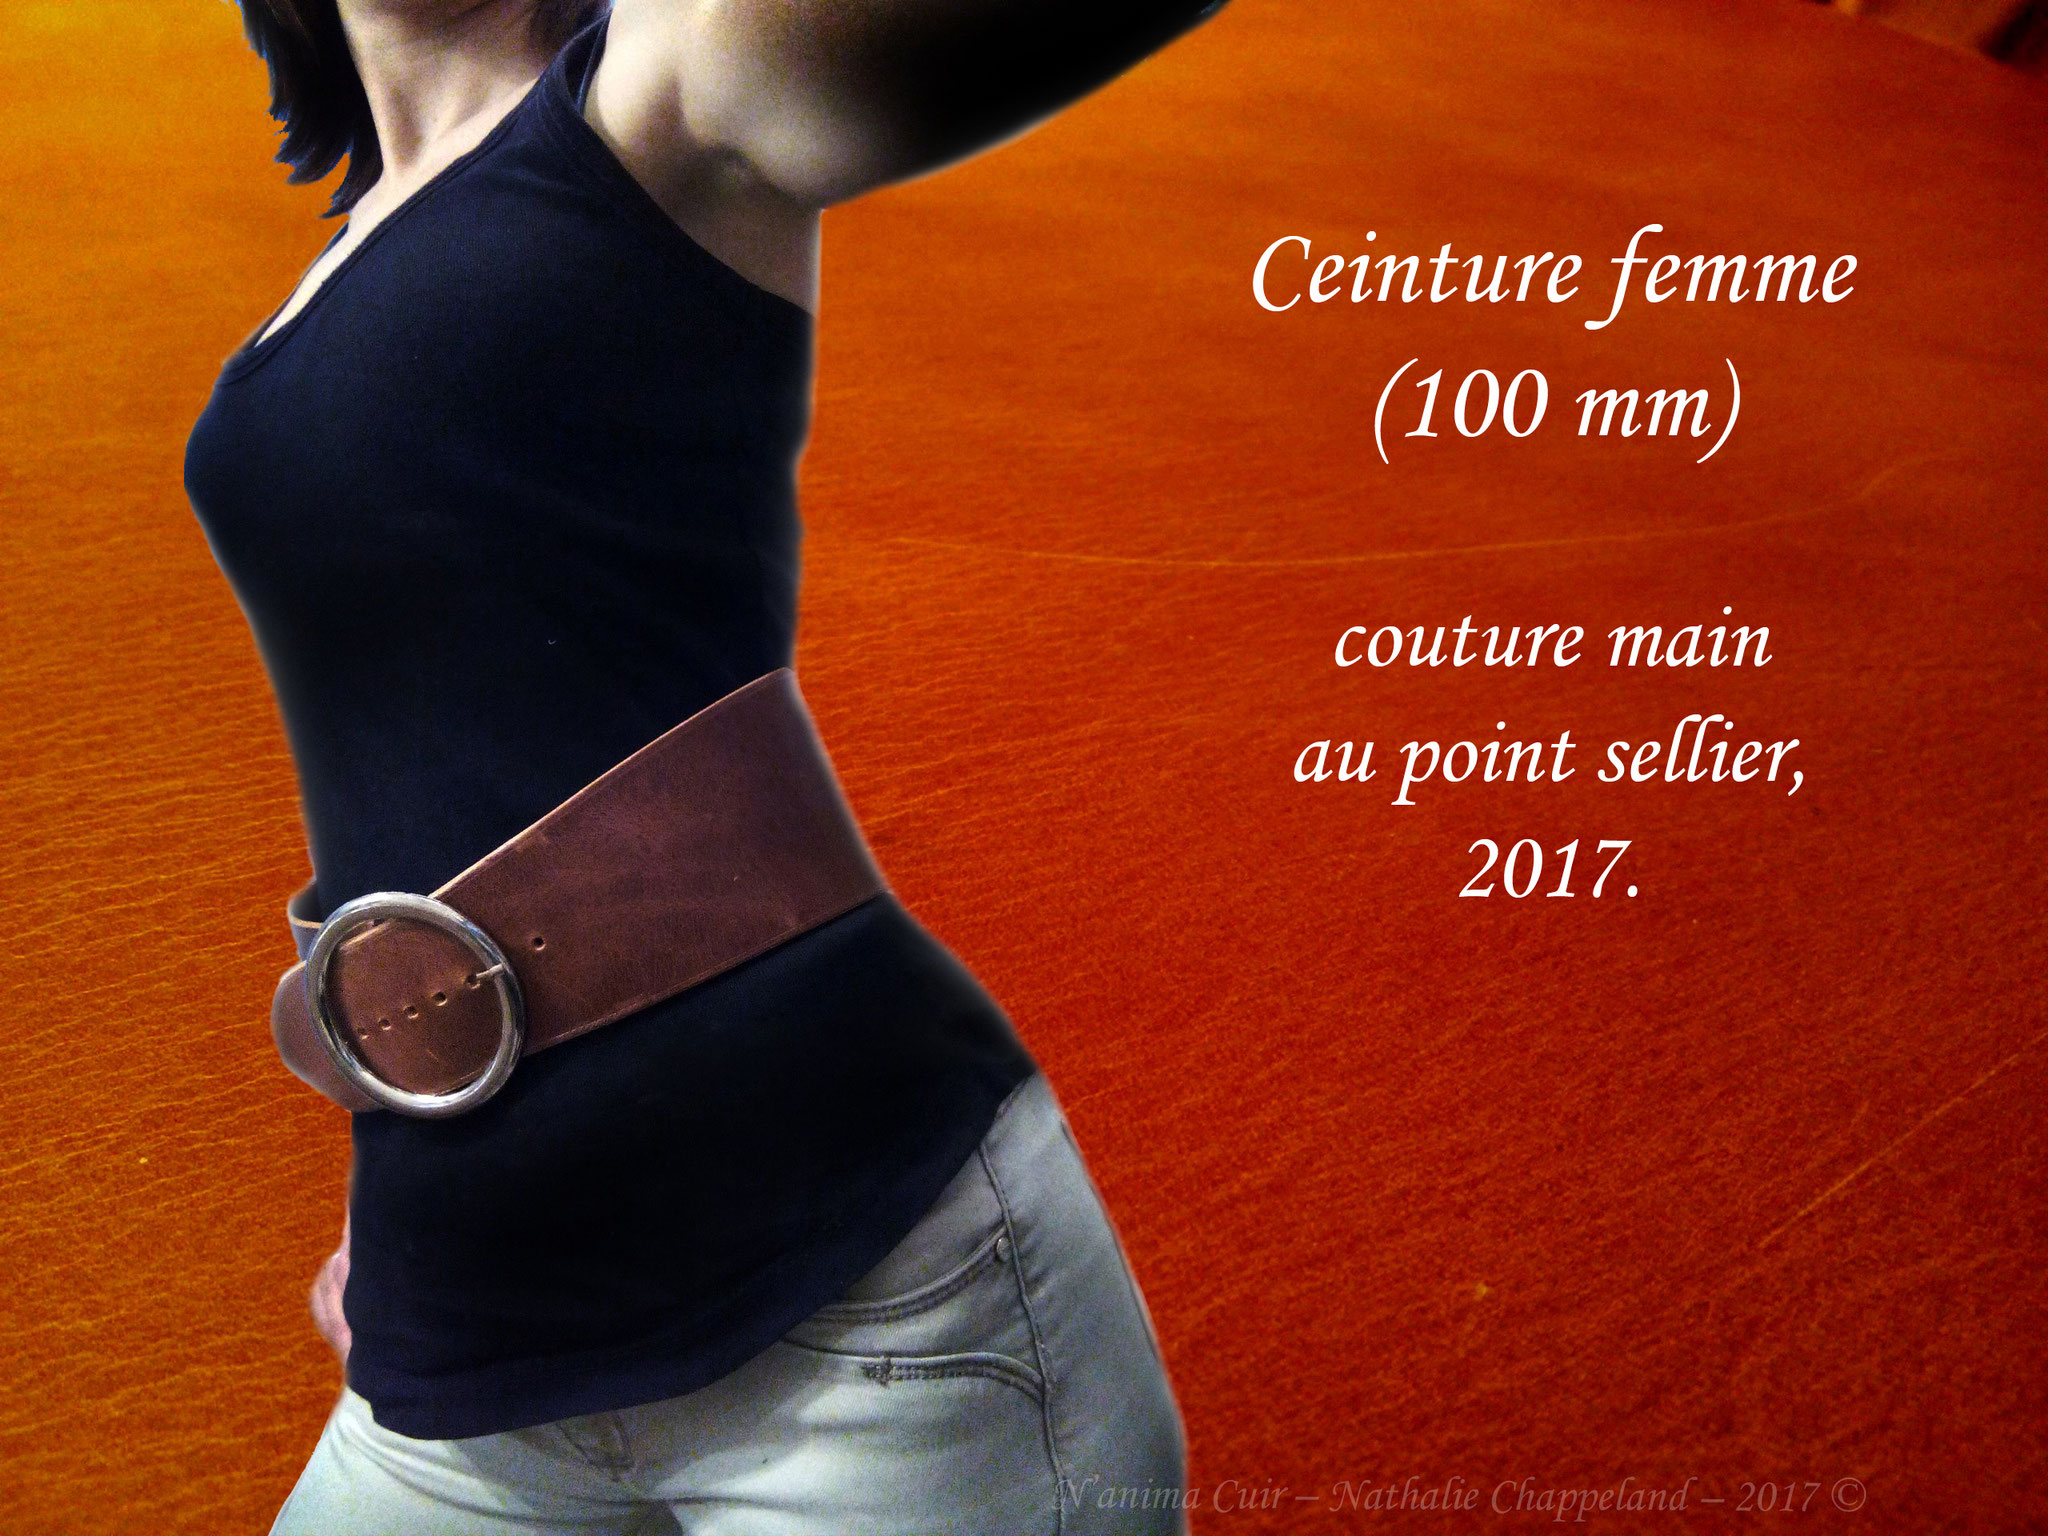 Ceinture femme (100mm), coutures main au point sellier, 2017 ©.